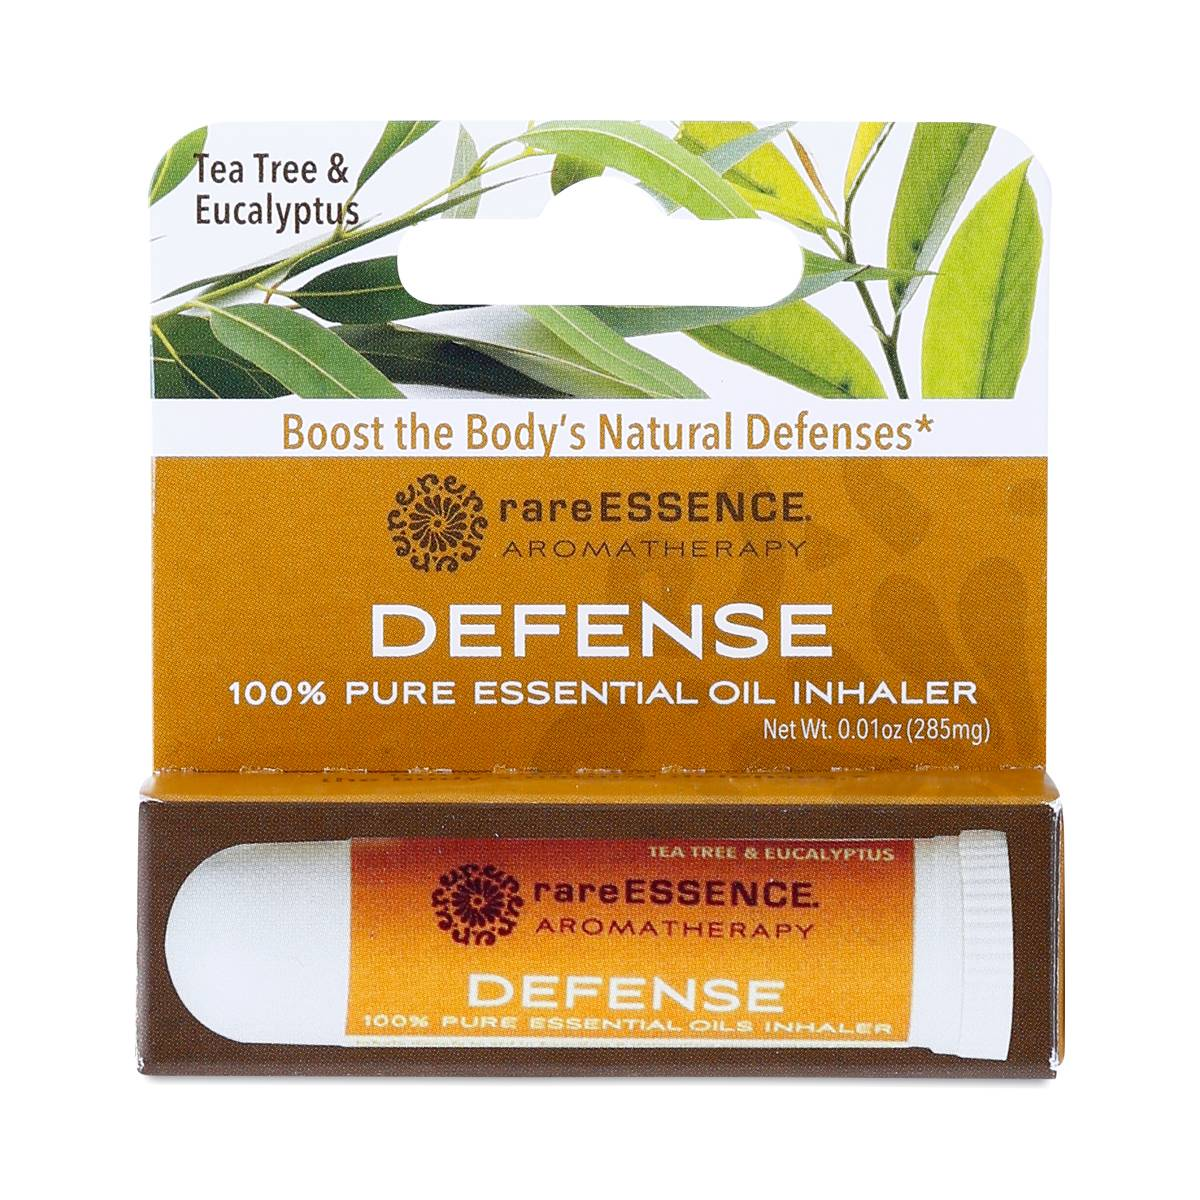 defense essential oil inhaler by rareearth naturals thrive market. Black Bedroom Furniture Sets. Home Design Ideas